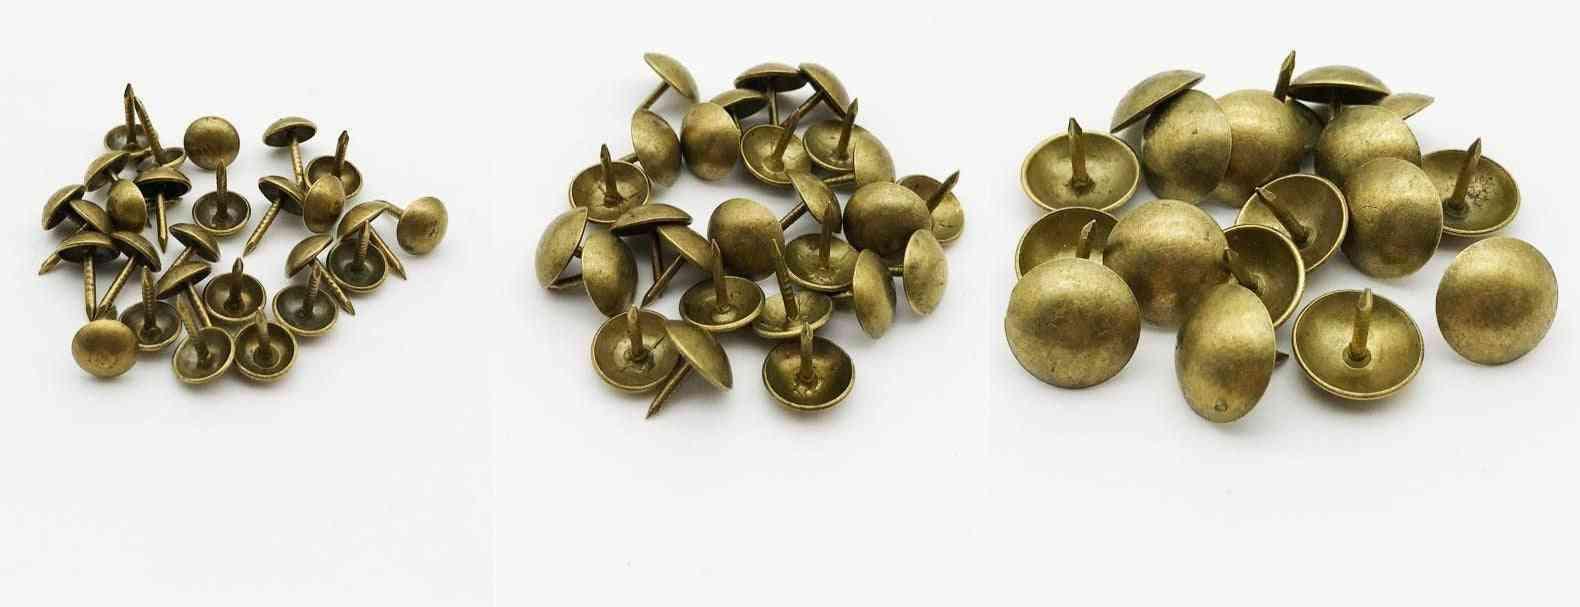 Tack Stud Pushpin Doornail, Antique Brass Bronze, Upholstery Nail Jewelry